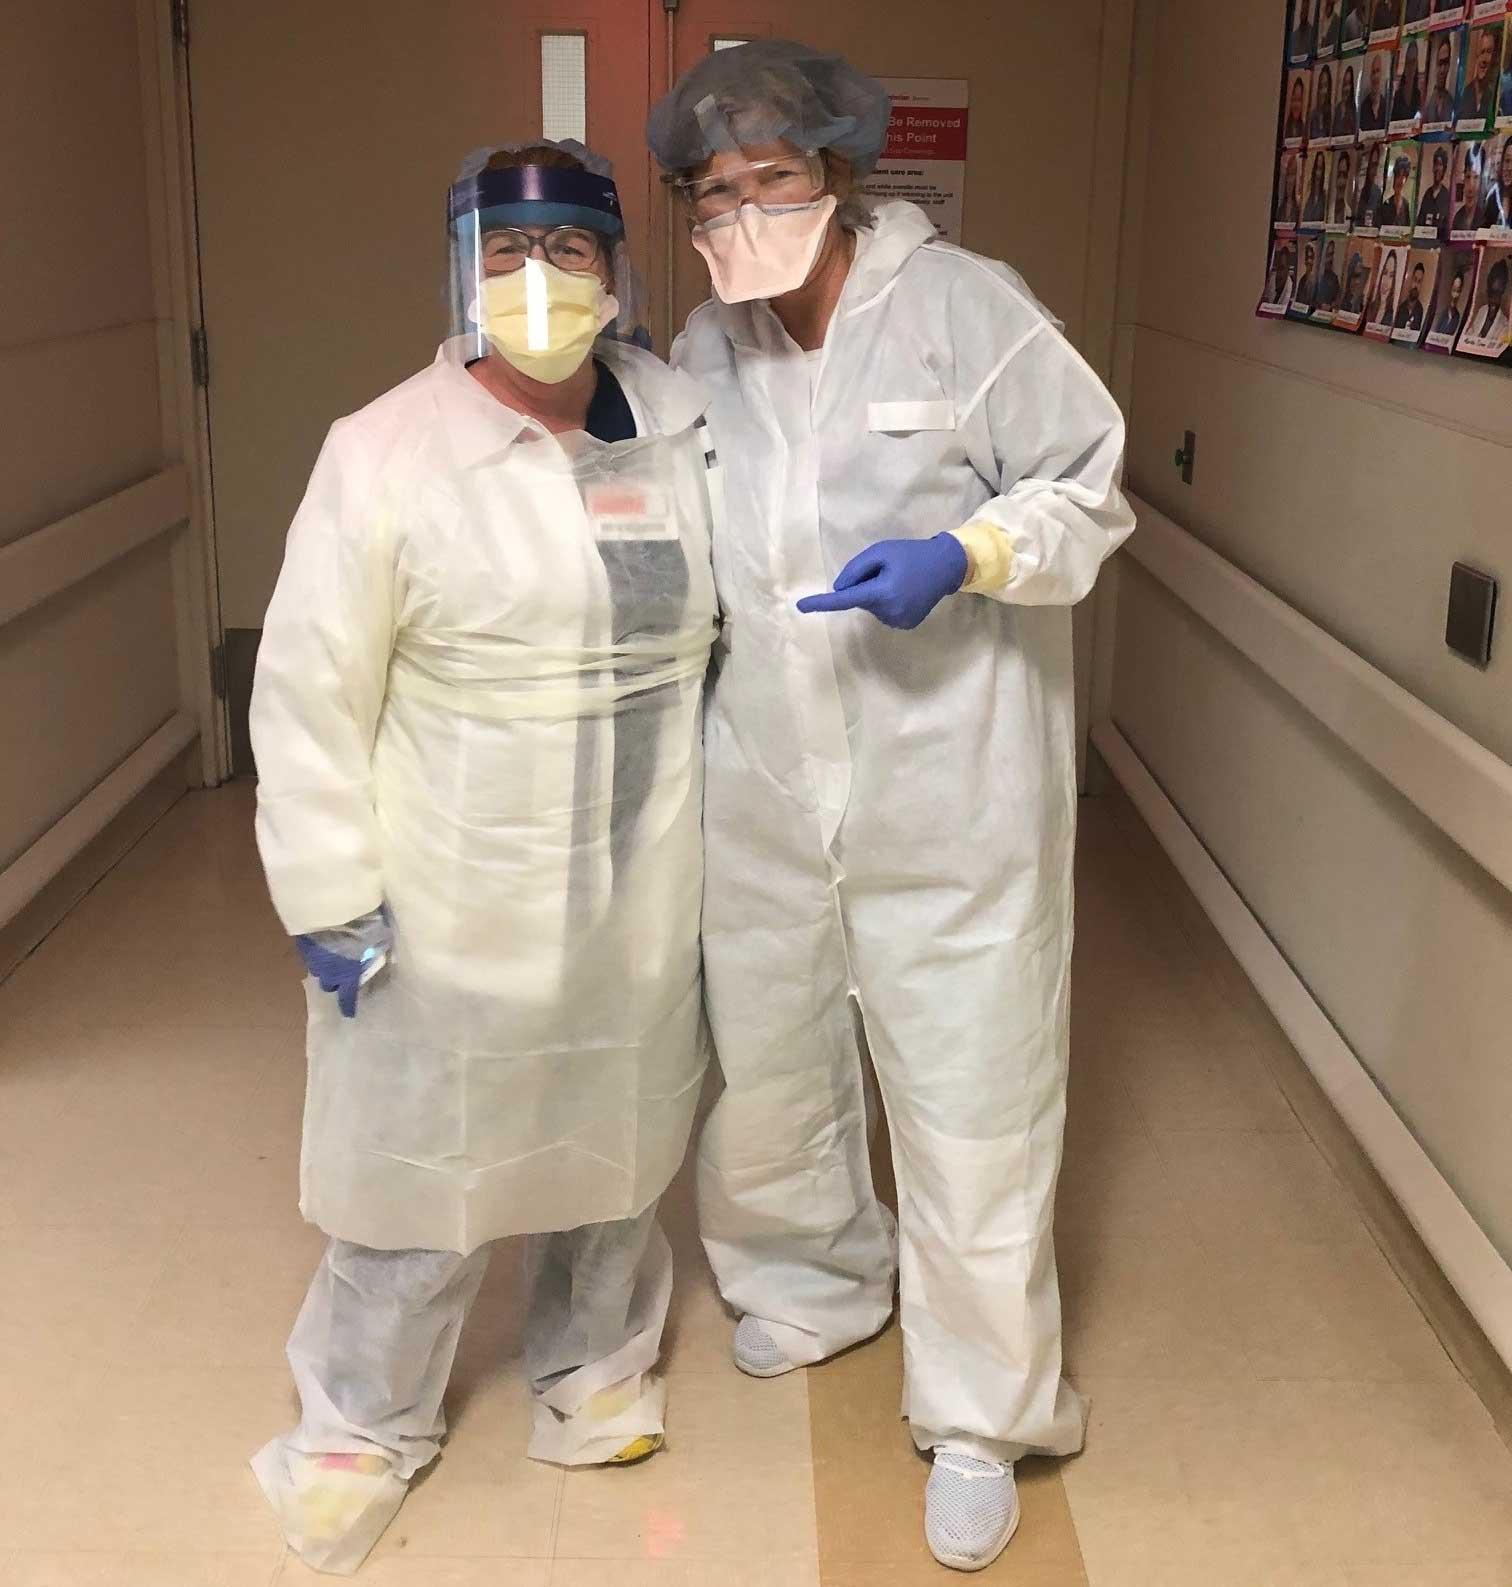 Photo shows nurses